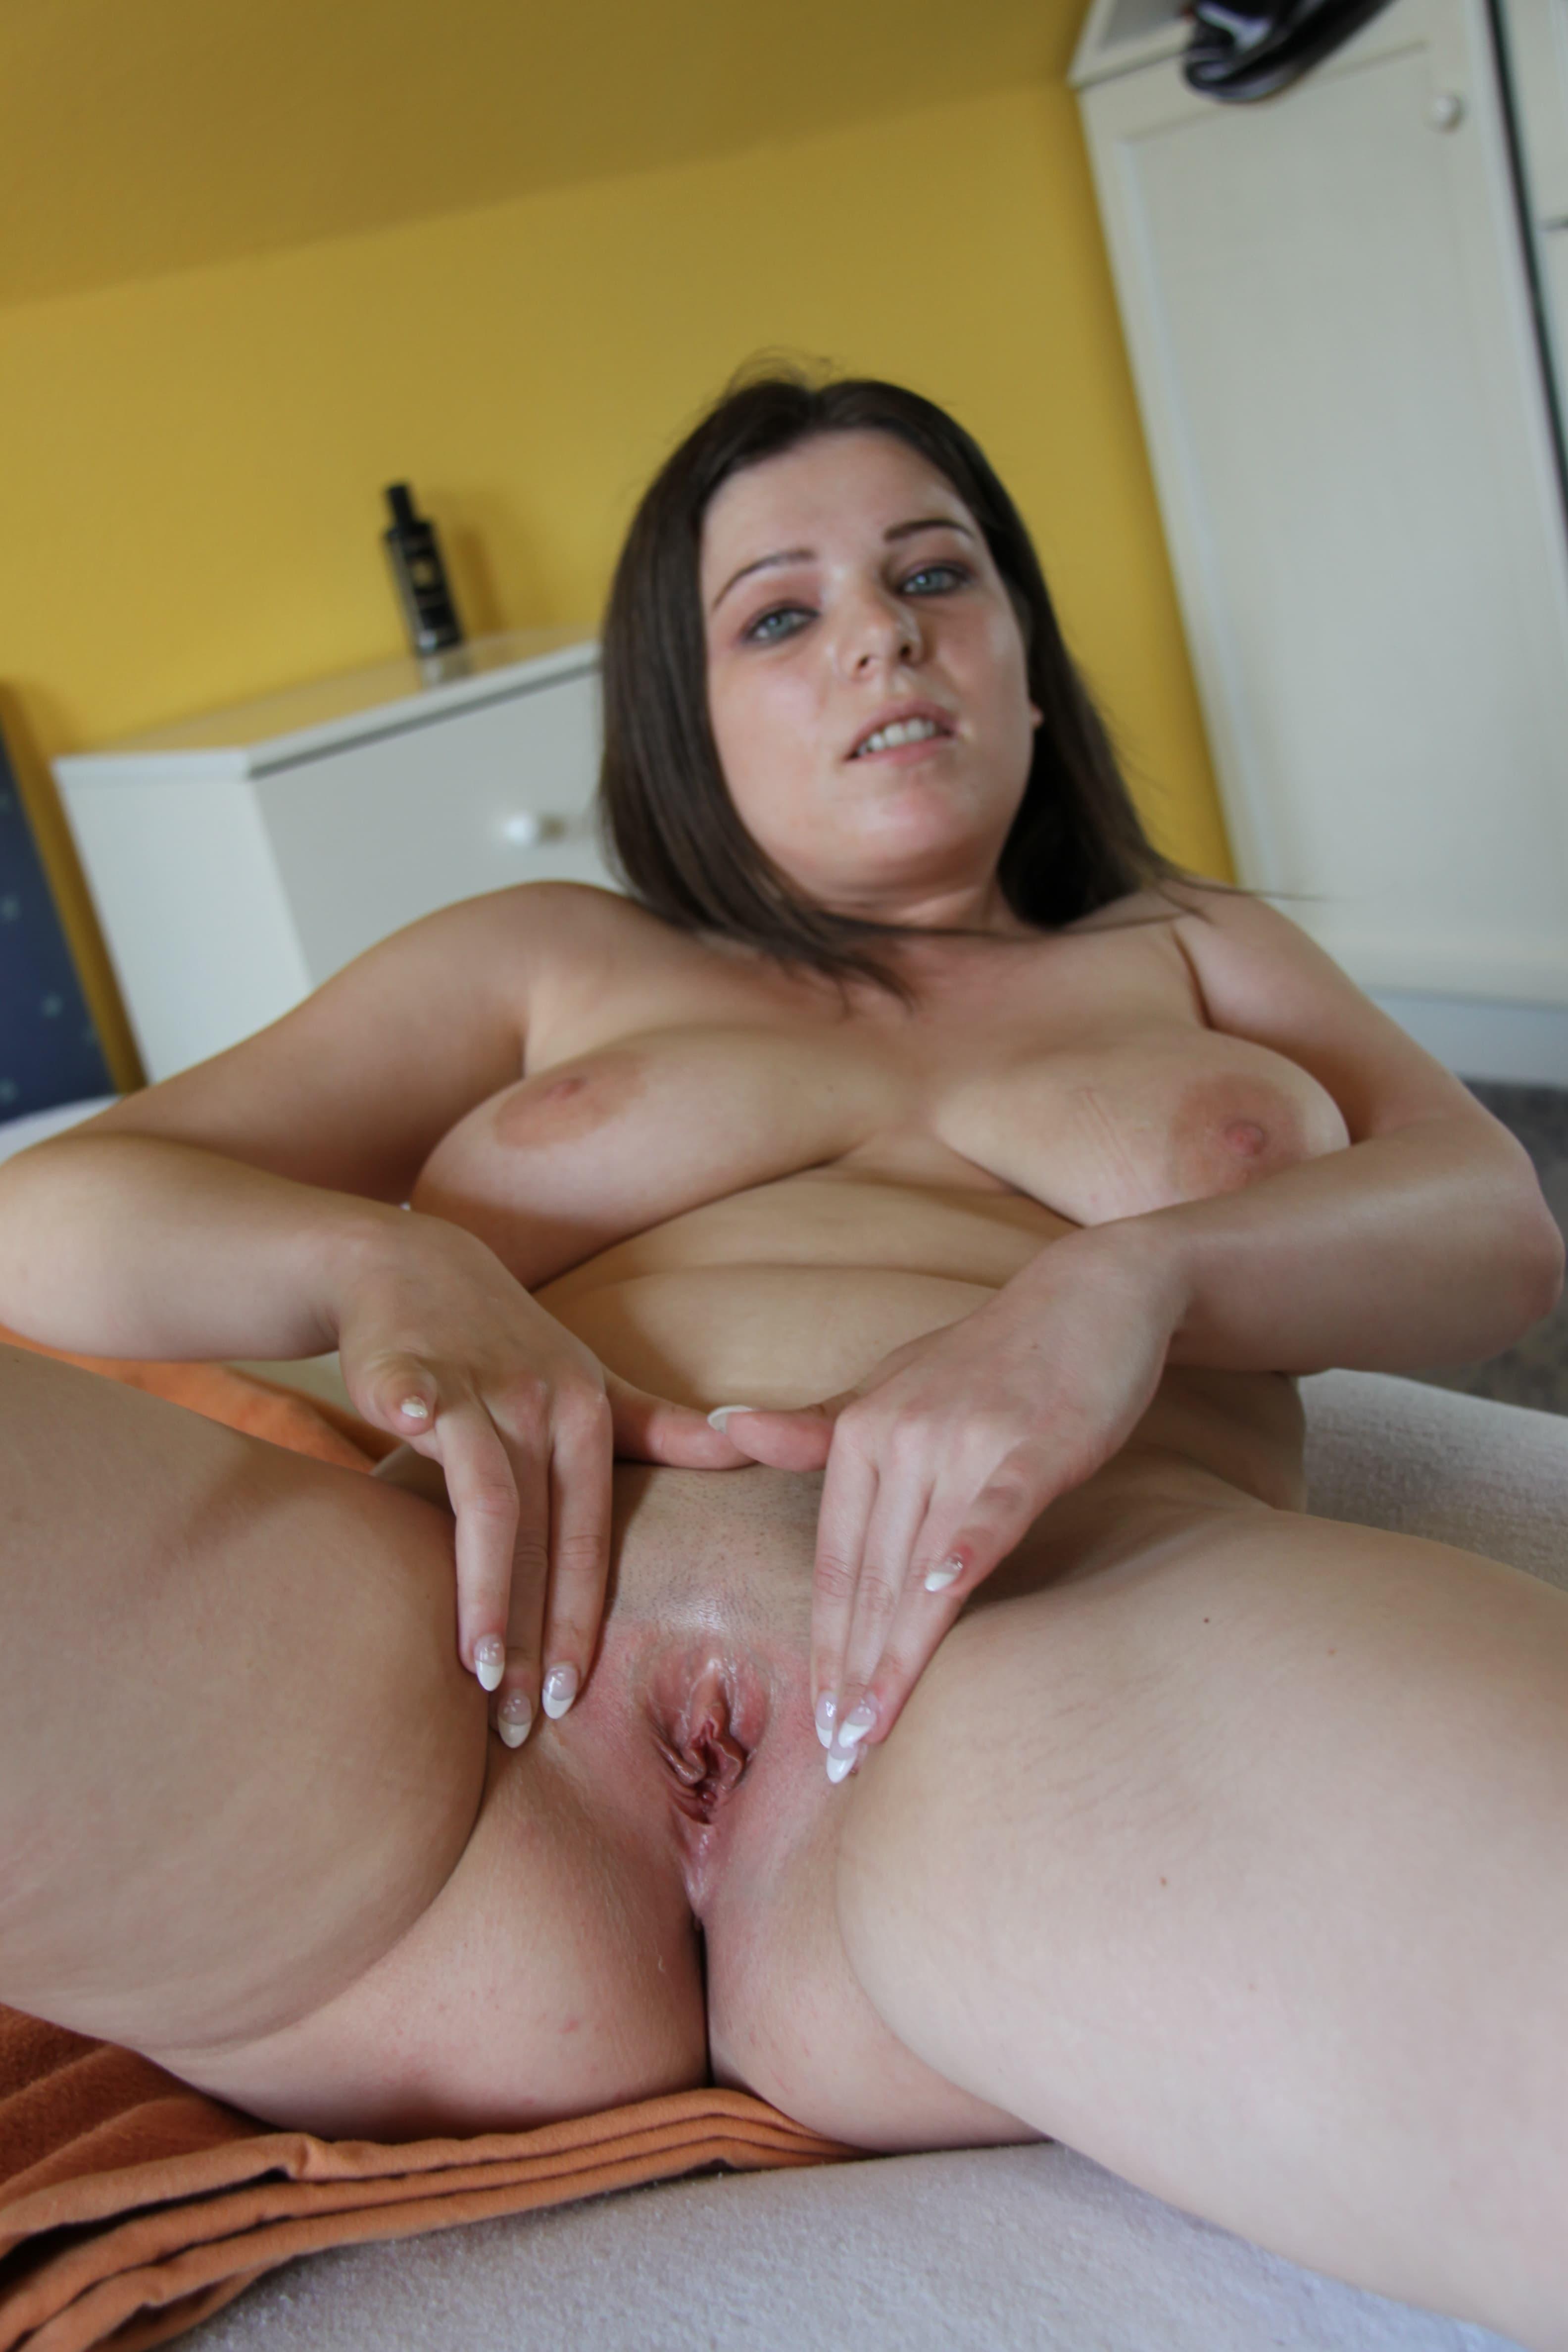 Cute Chubby Girls Pussy Ass